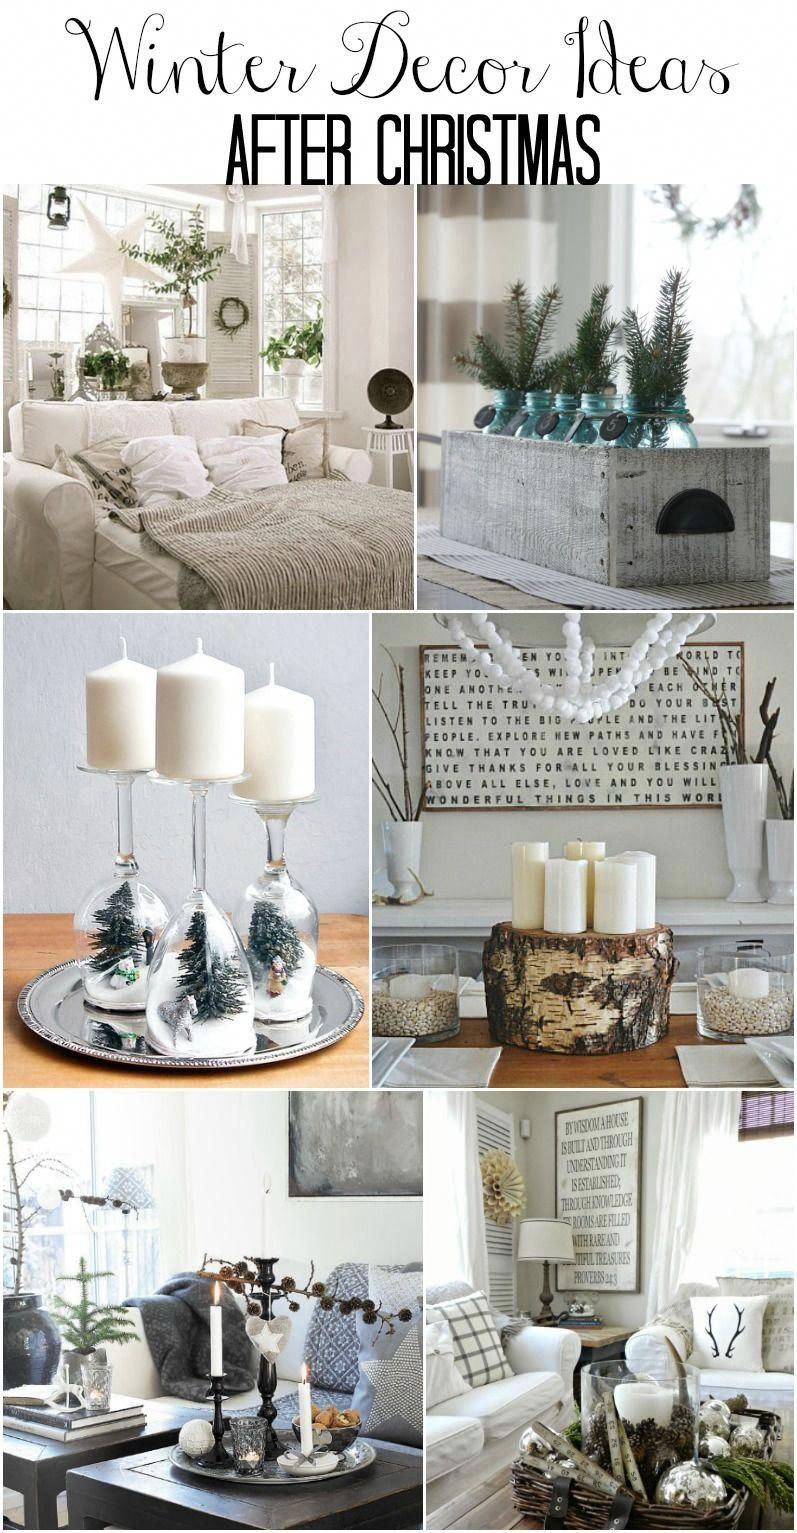 Winter Decor Ideas For The Home Winter Home Decor Winter Decor Ideas For The Home Easy Home Decor